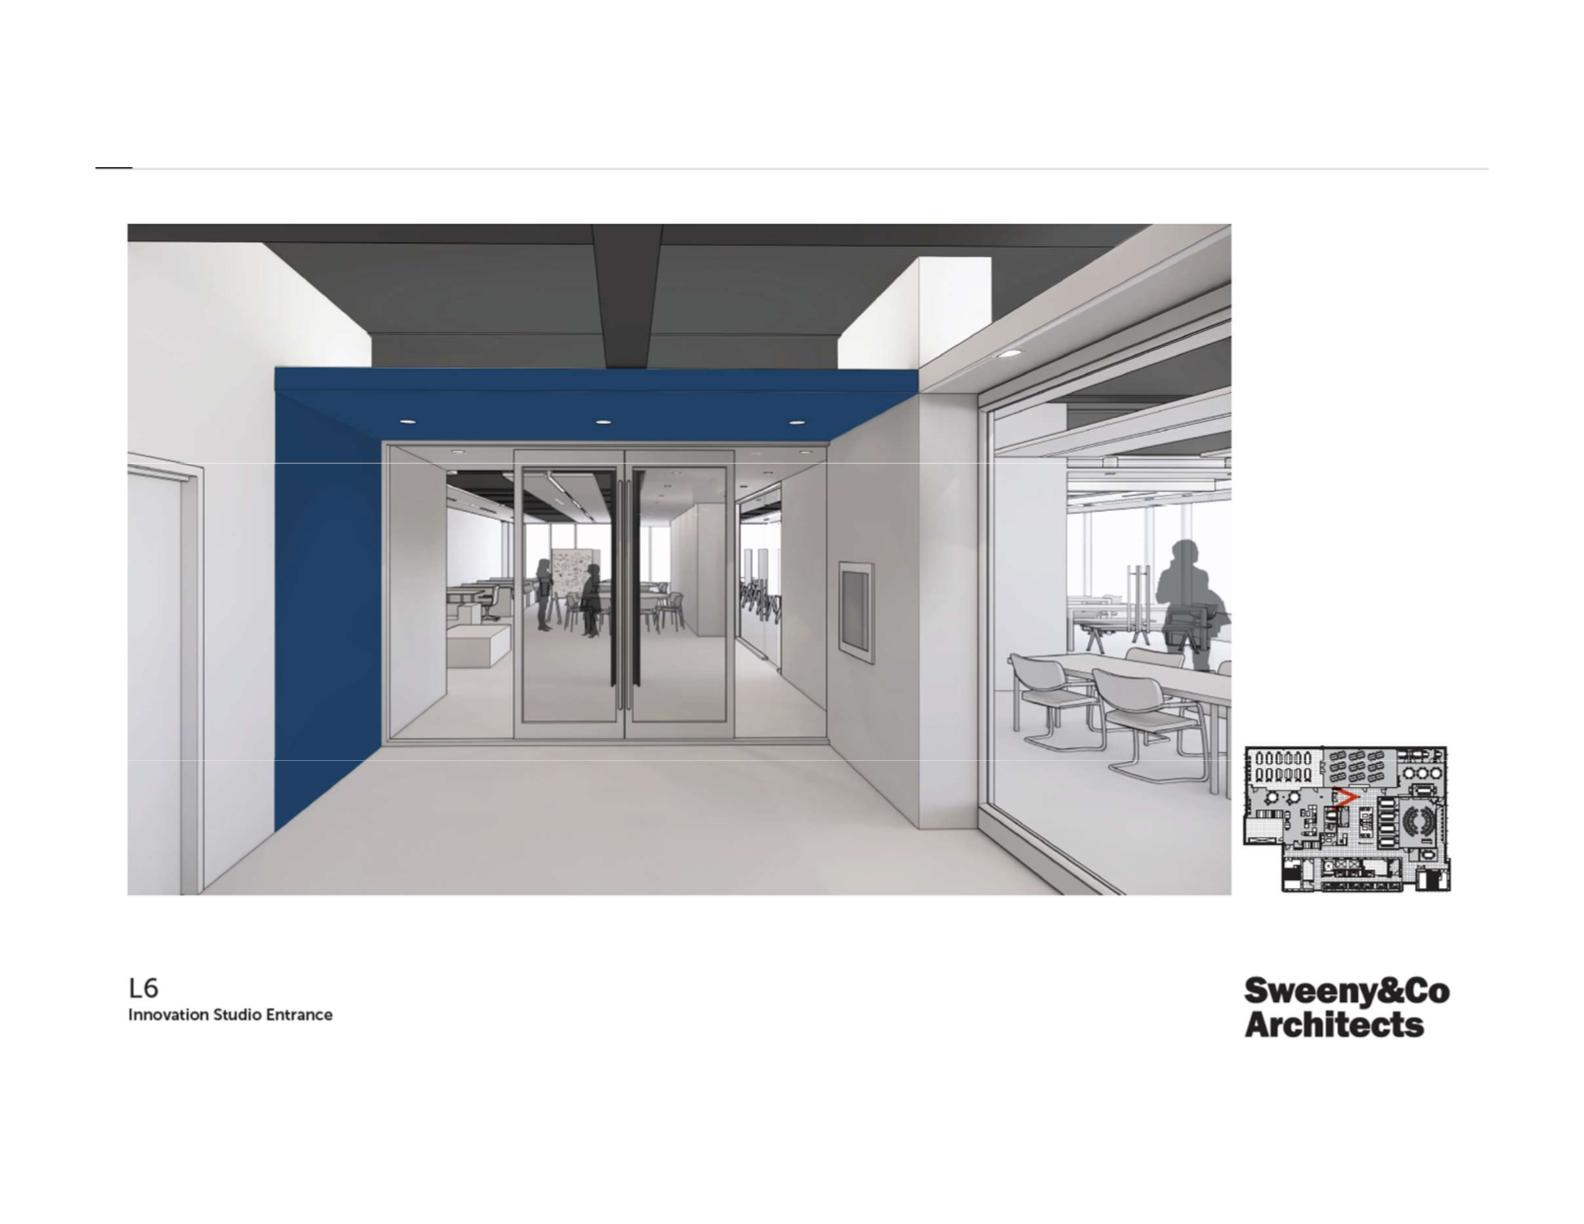 Innovation Studio Entrance